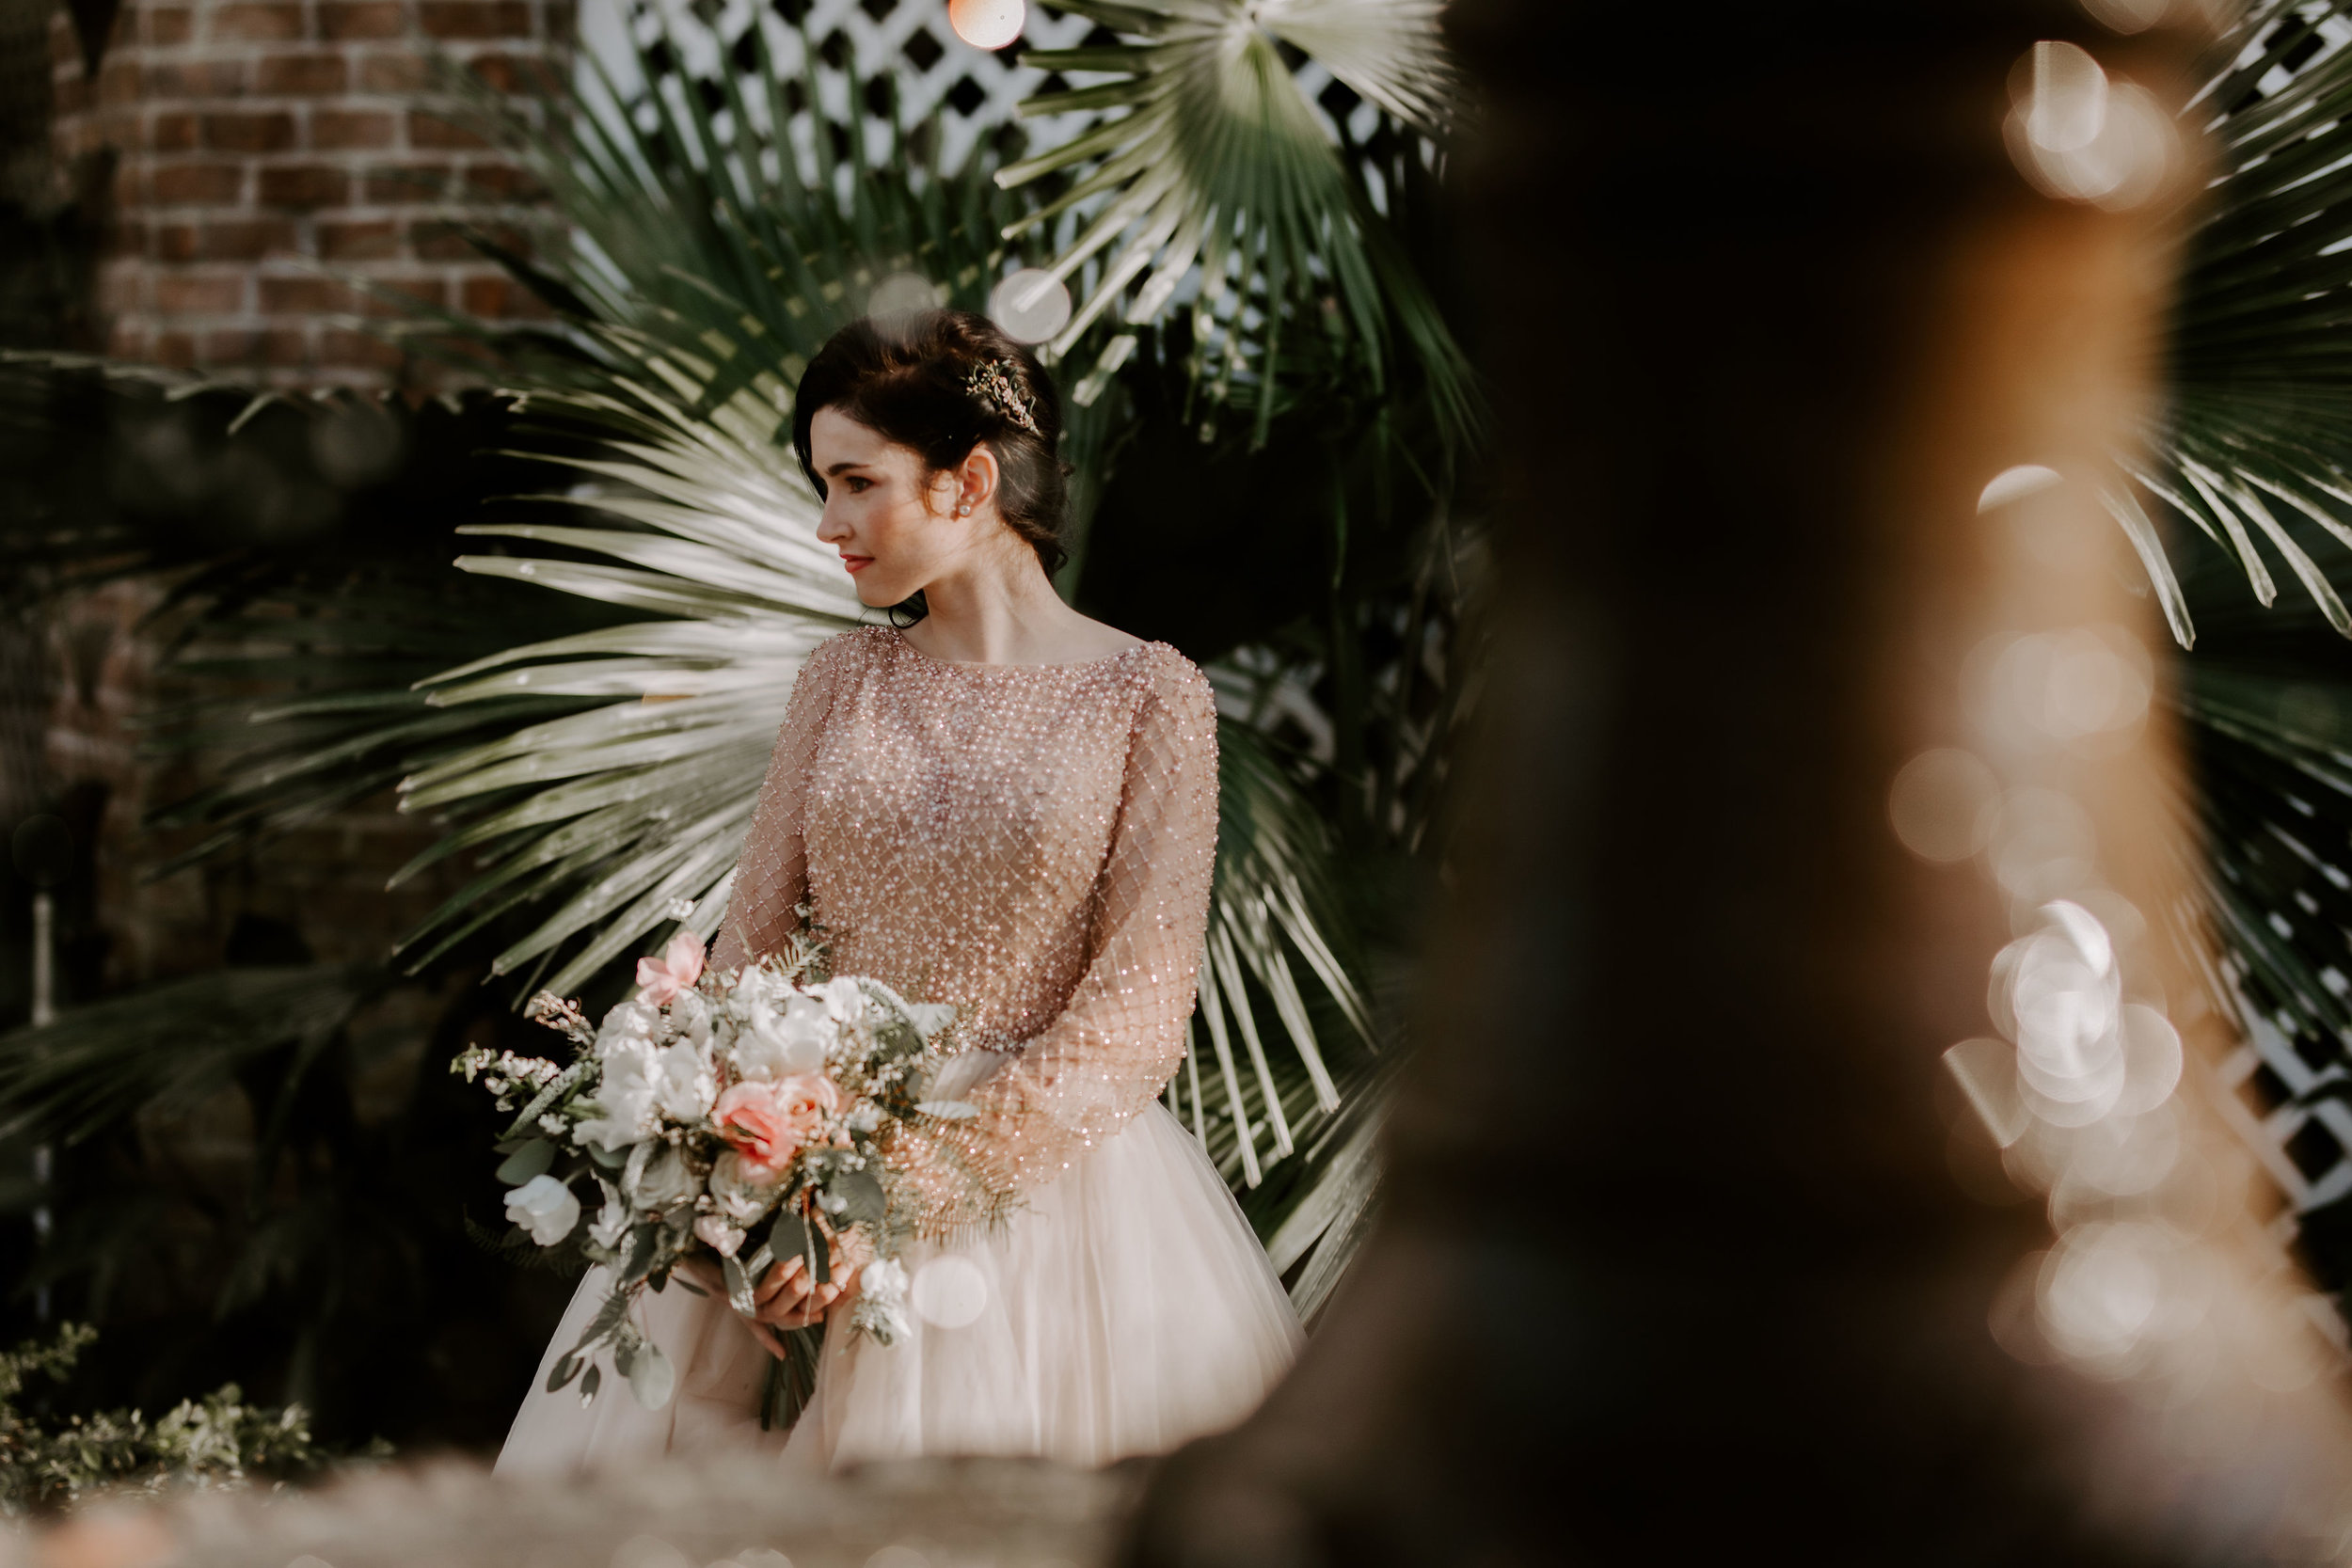 ivory-and-beau-blog-mackey-house-styled-shoot-savannah-wedding-bridal-boutique-savannah-florist-southern-wedding-_G5A2382.jpg